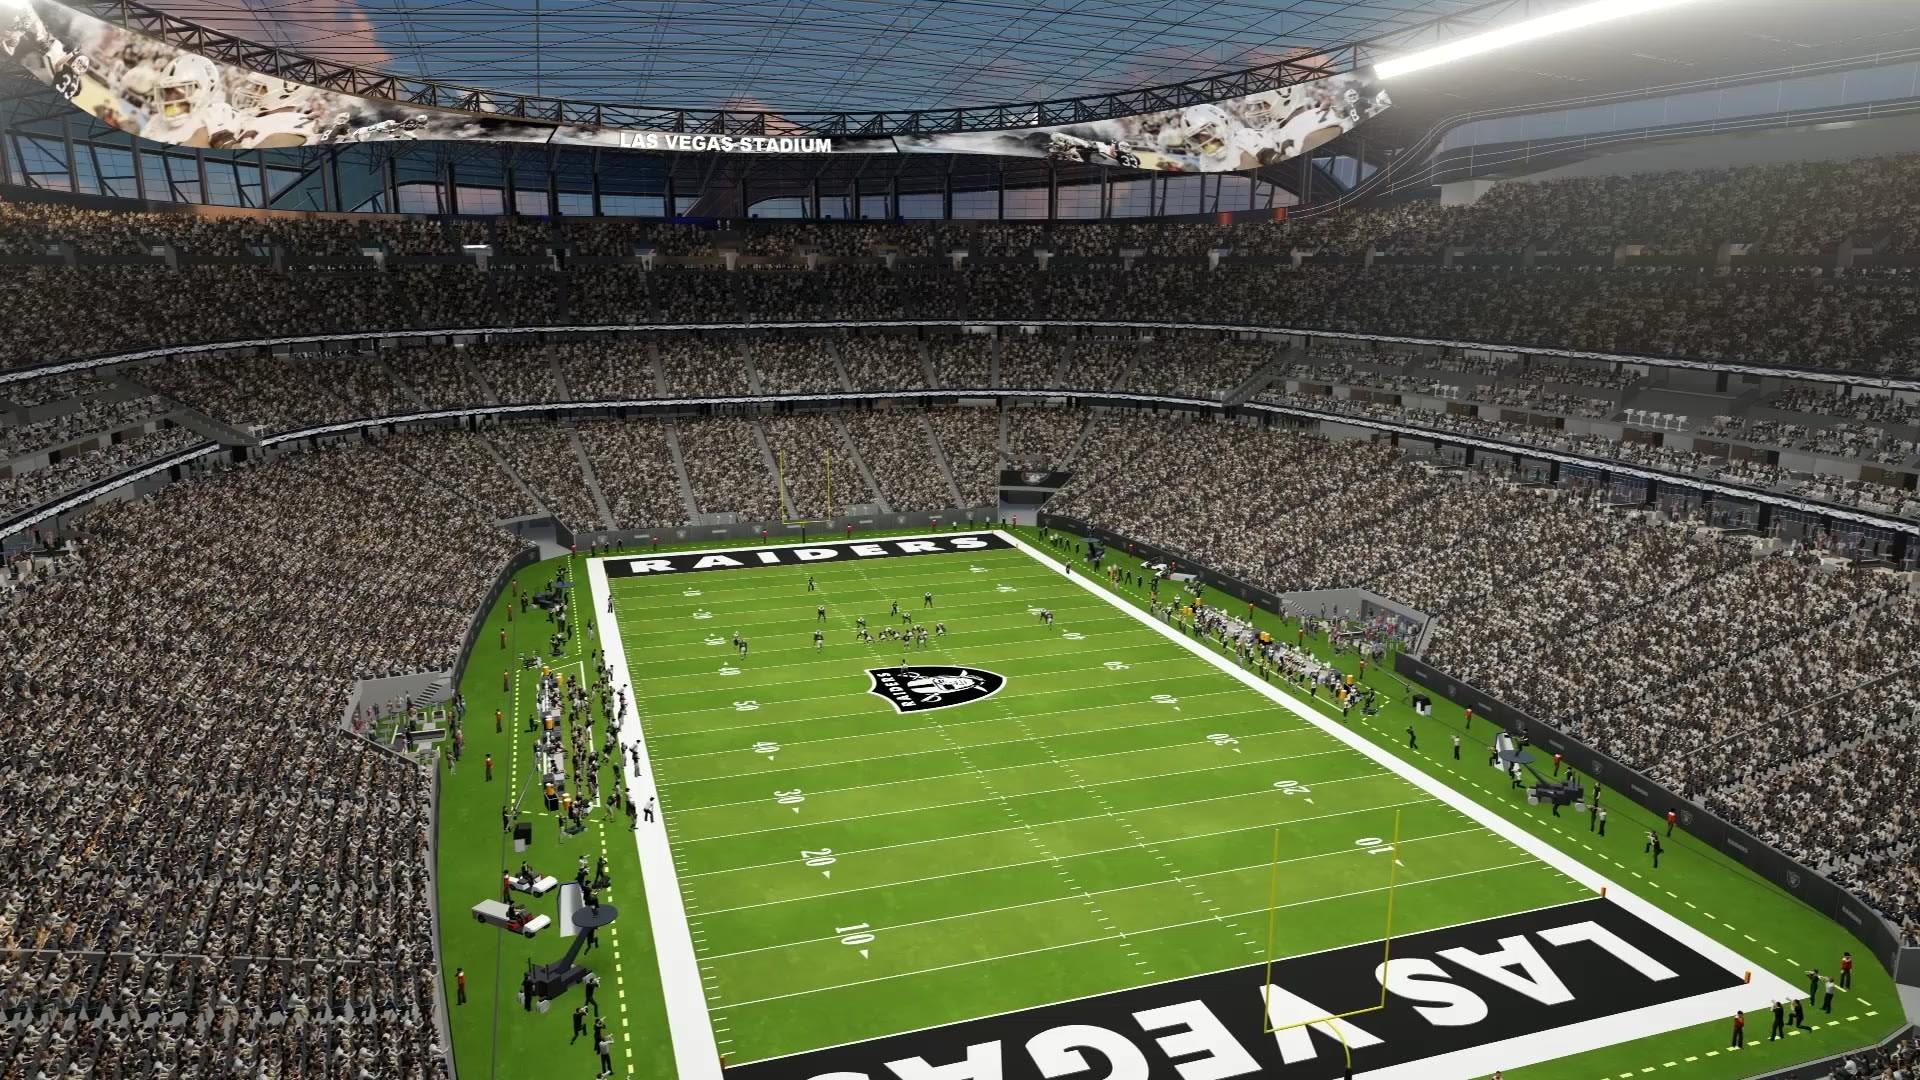 Raiders Finalize 1 8b Deal With Las Vegas Stadium Authority Las Vegas Review Journal